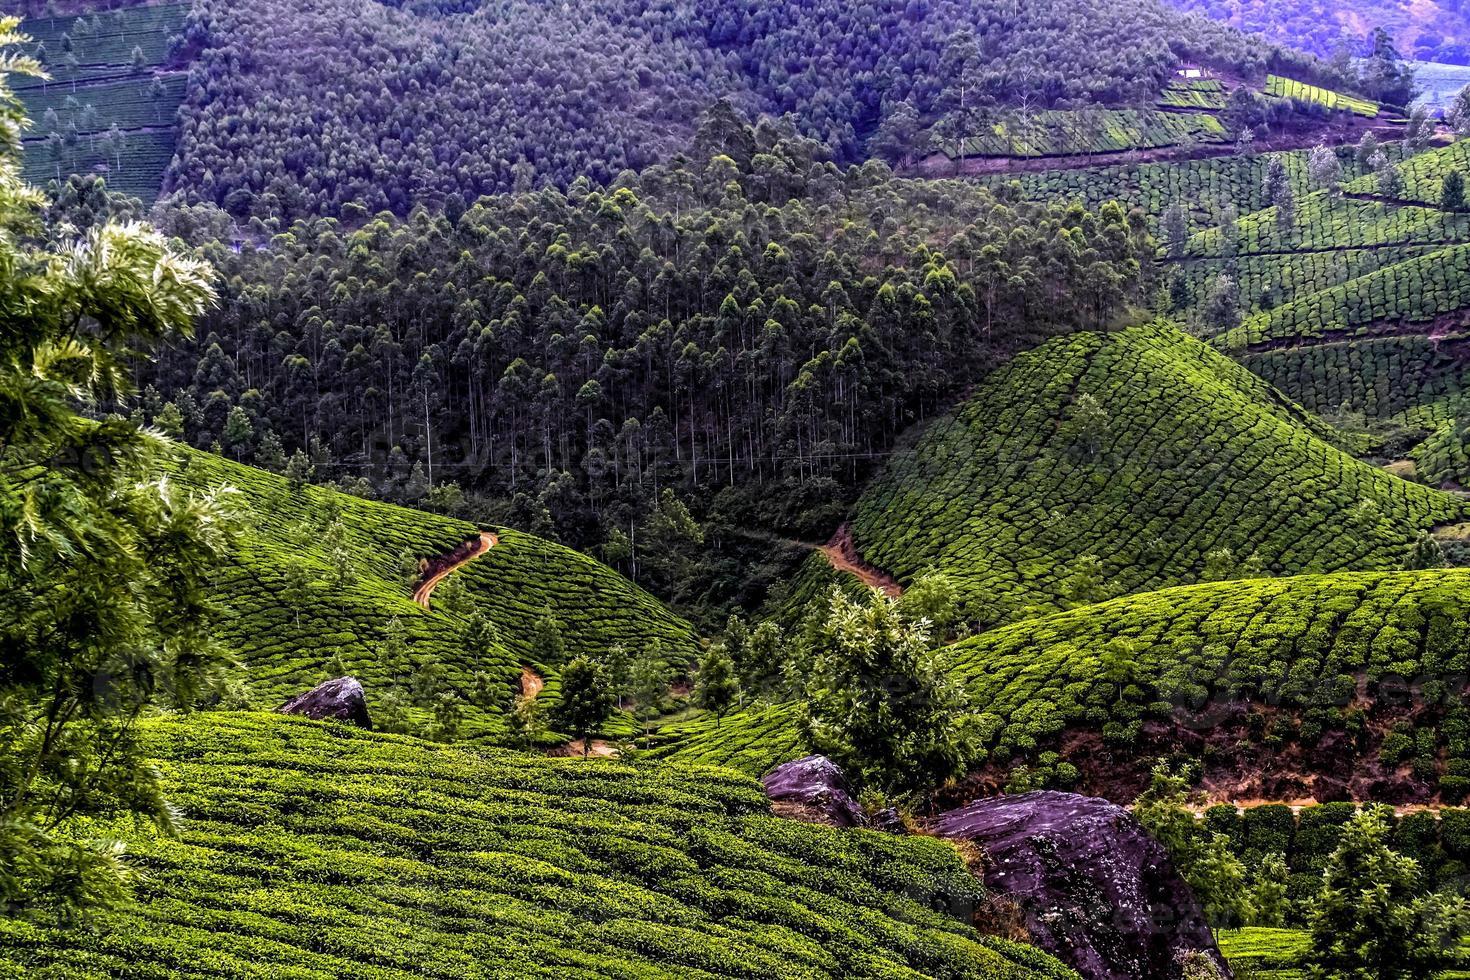 plantación de té munnar foto